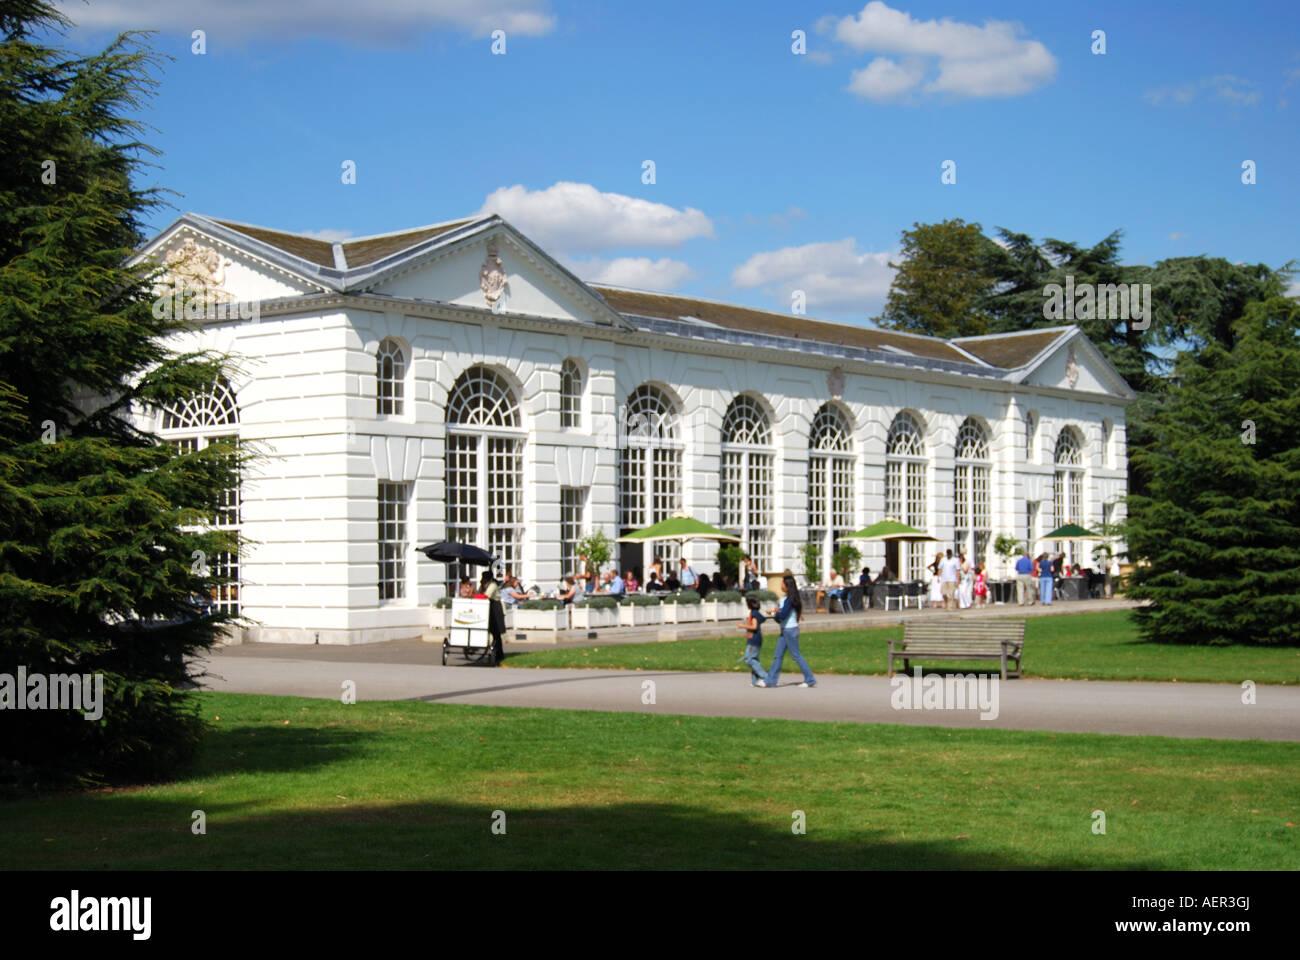 The Orangery Restaurant, Royal Botanical Gardens, Kew, Greater London,  England, United Kingdom